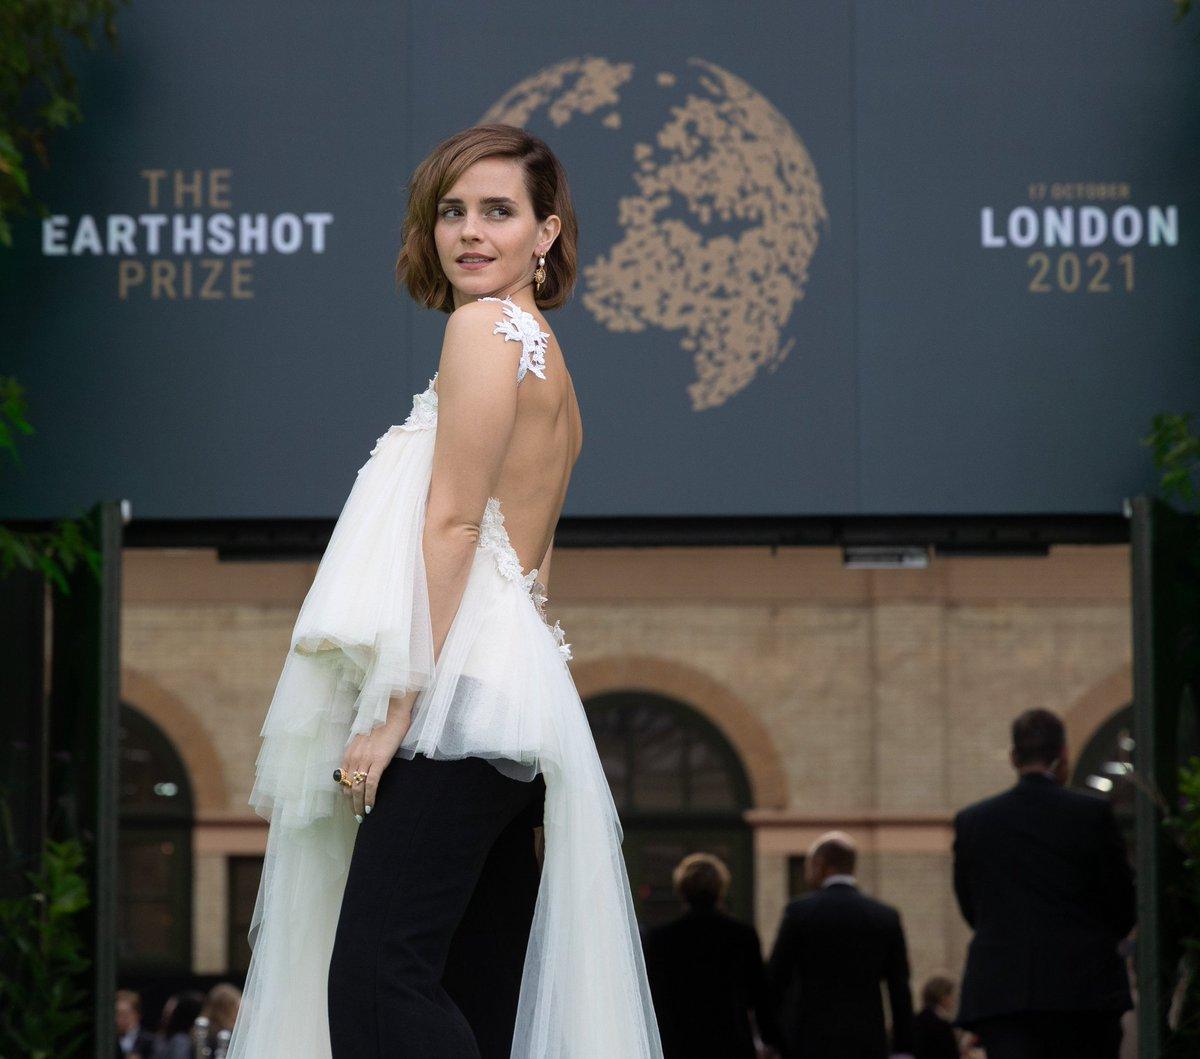 Actor and Activist Emma Watson arrives for #EarthshotLondon2021